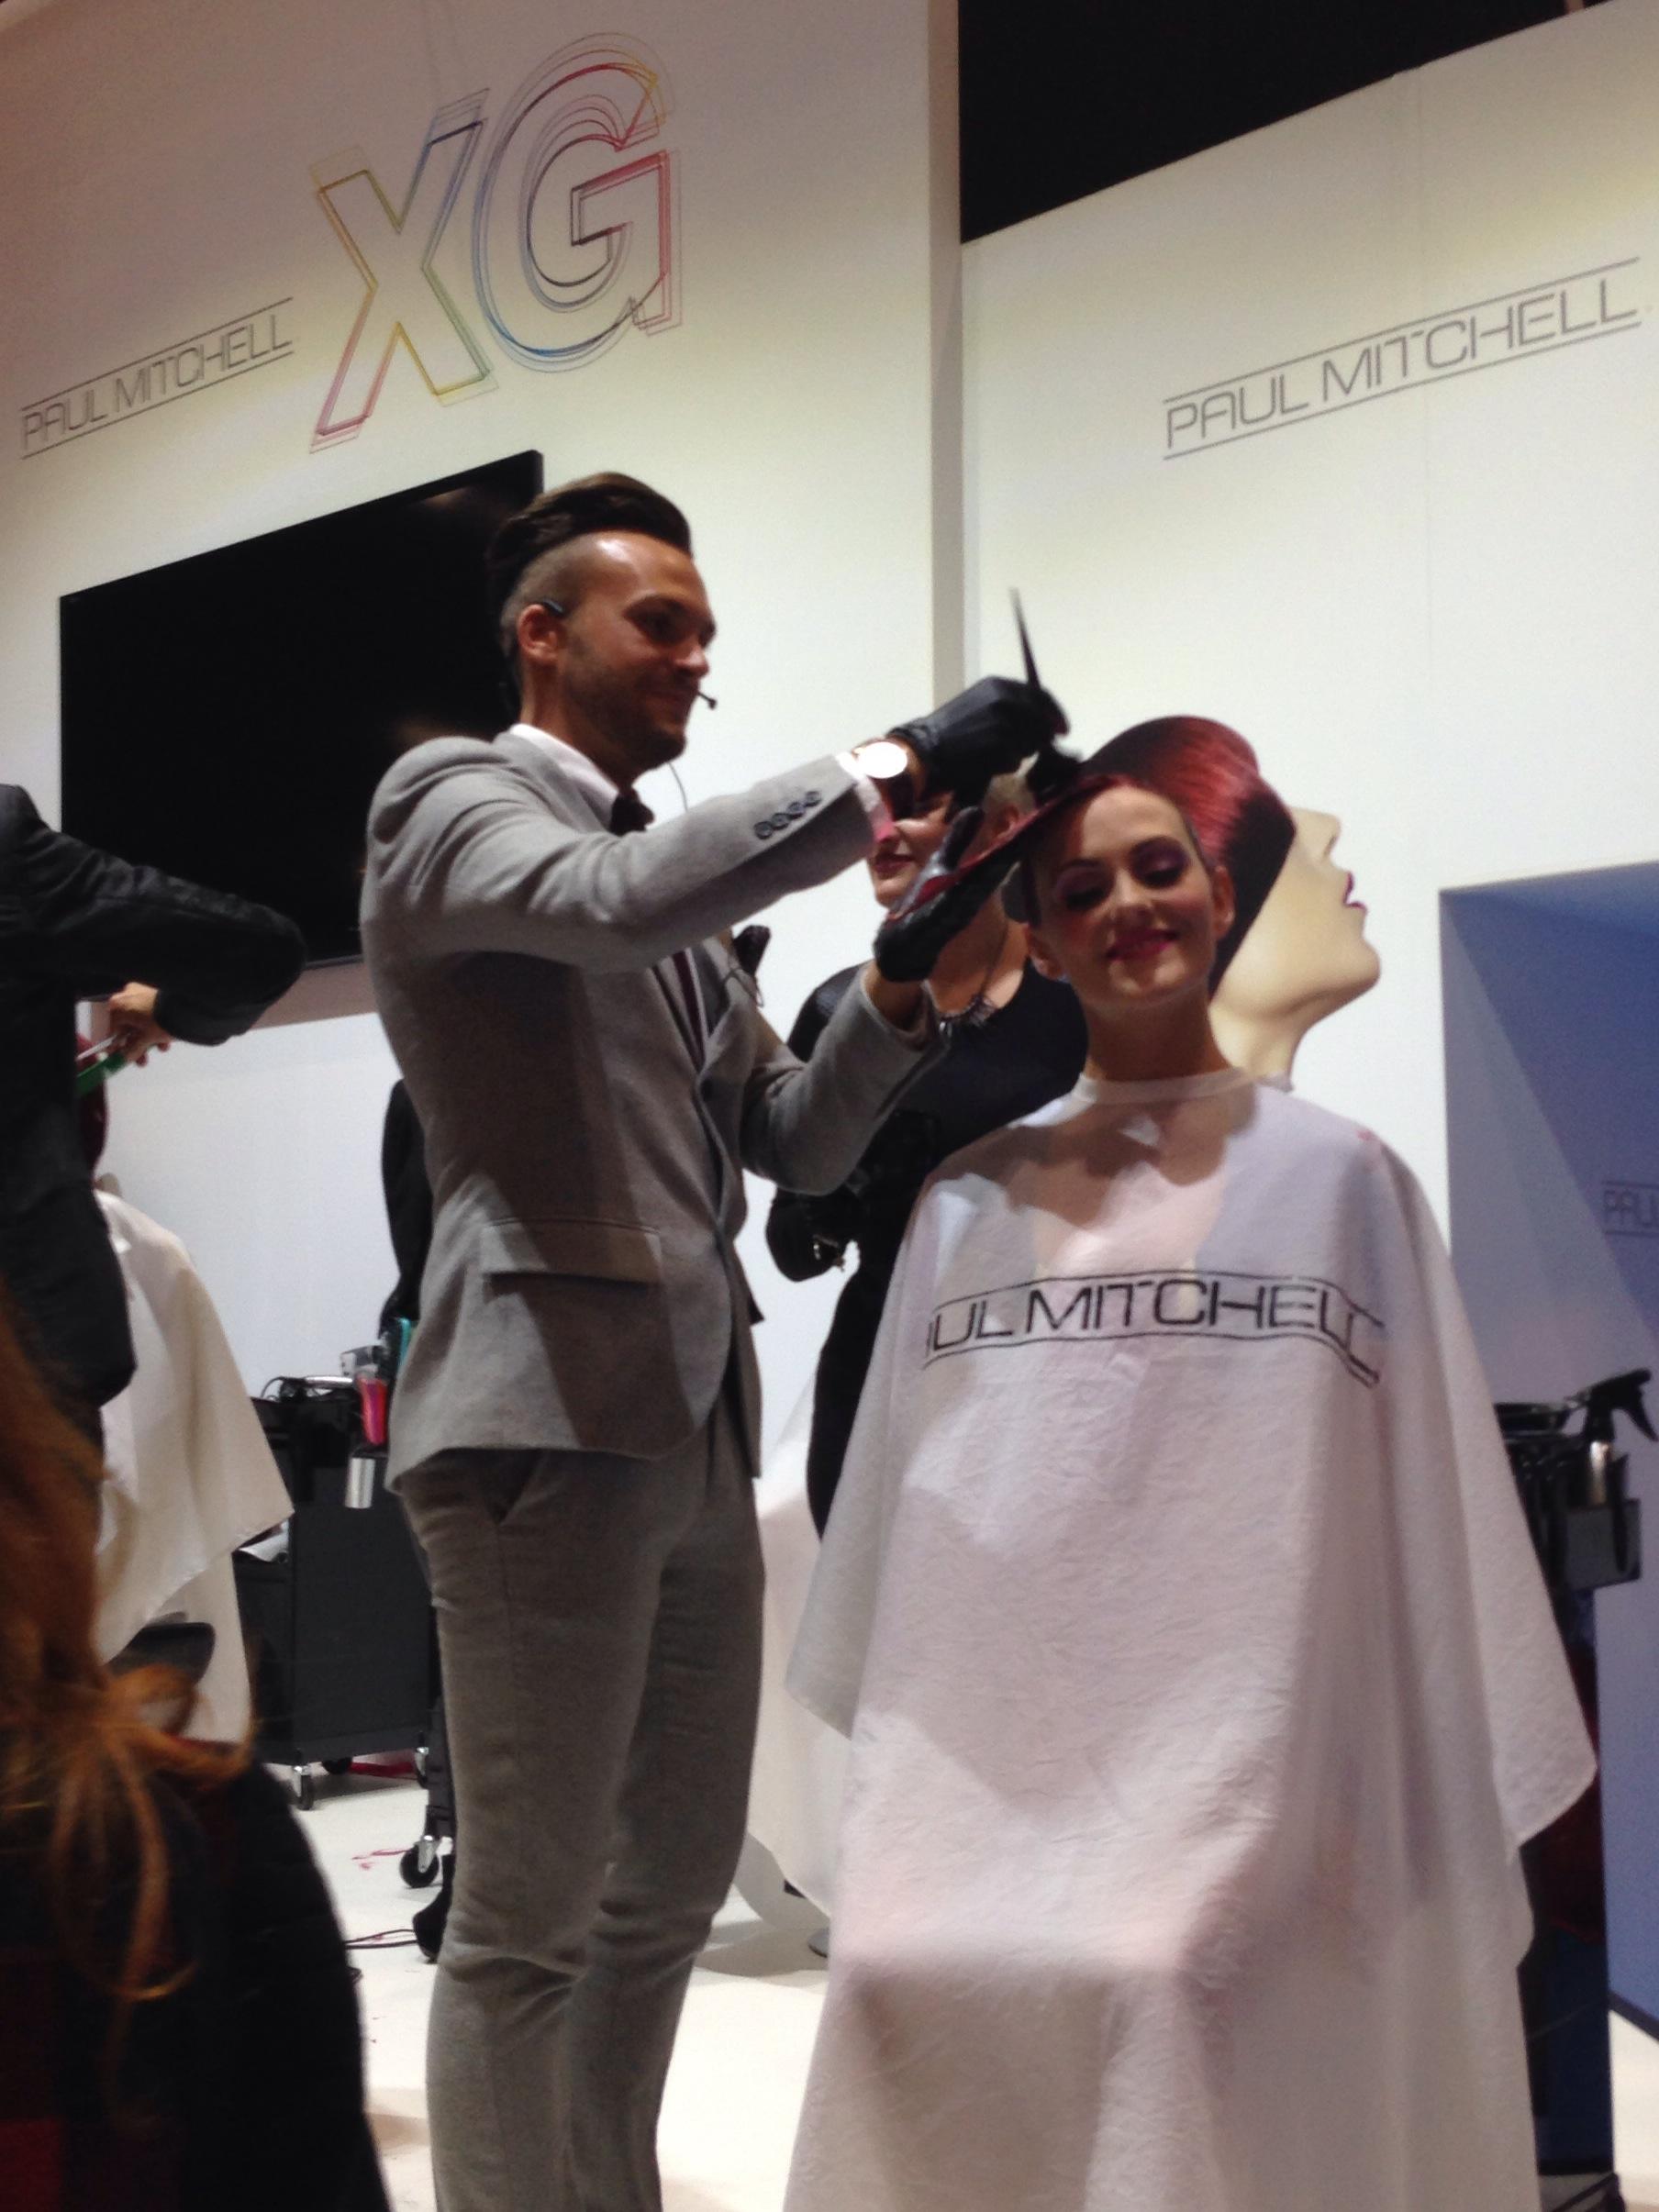 london-hair-expo-2013-paul-mitchel.jpg